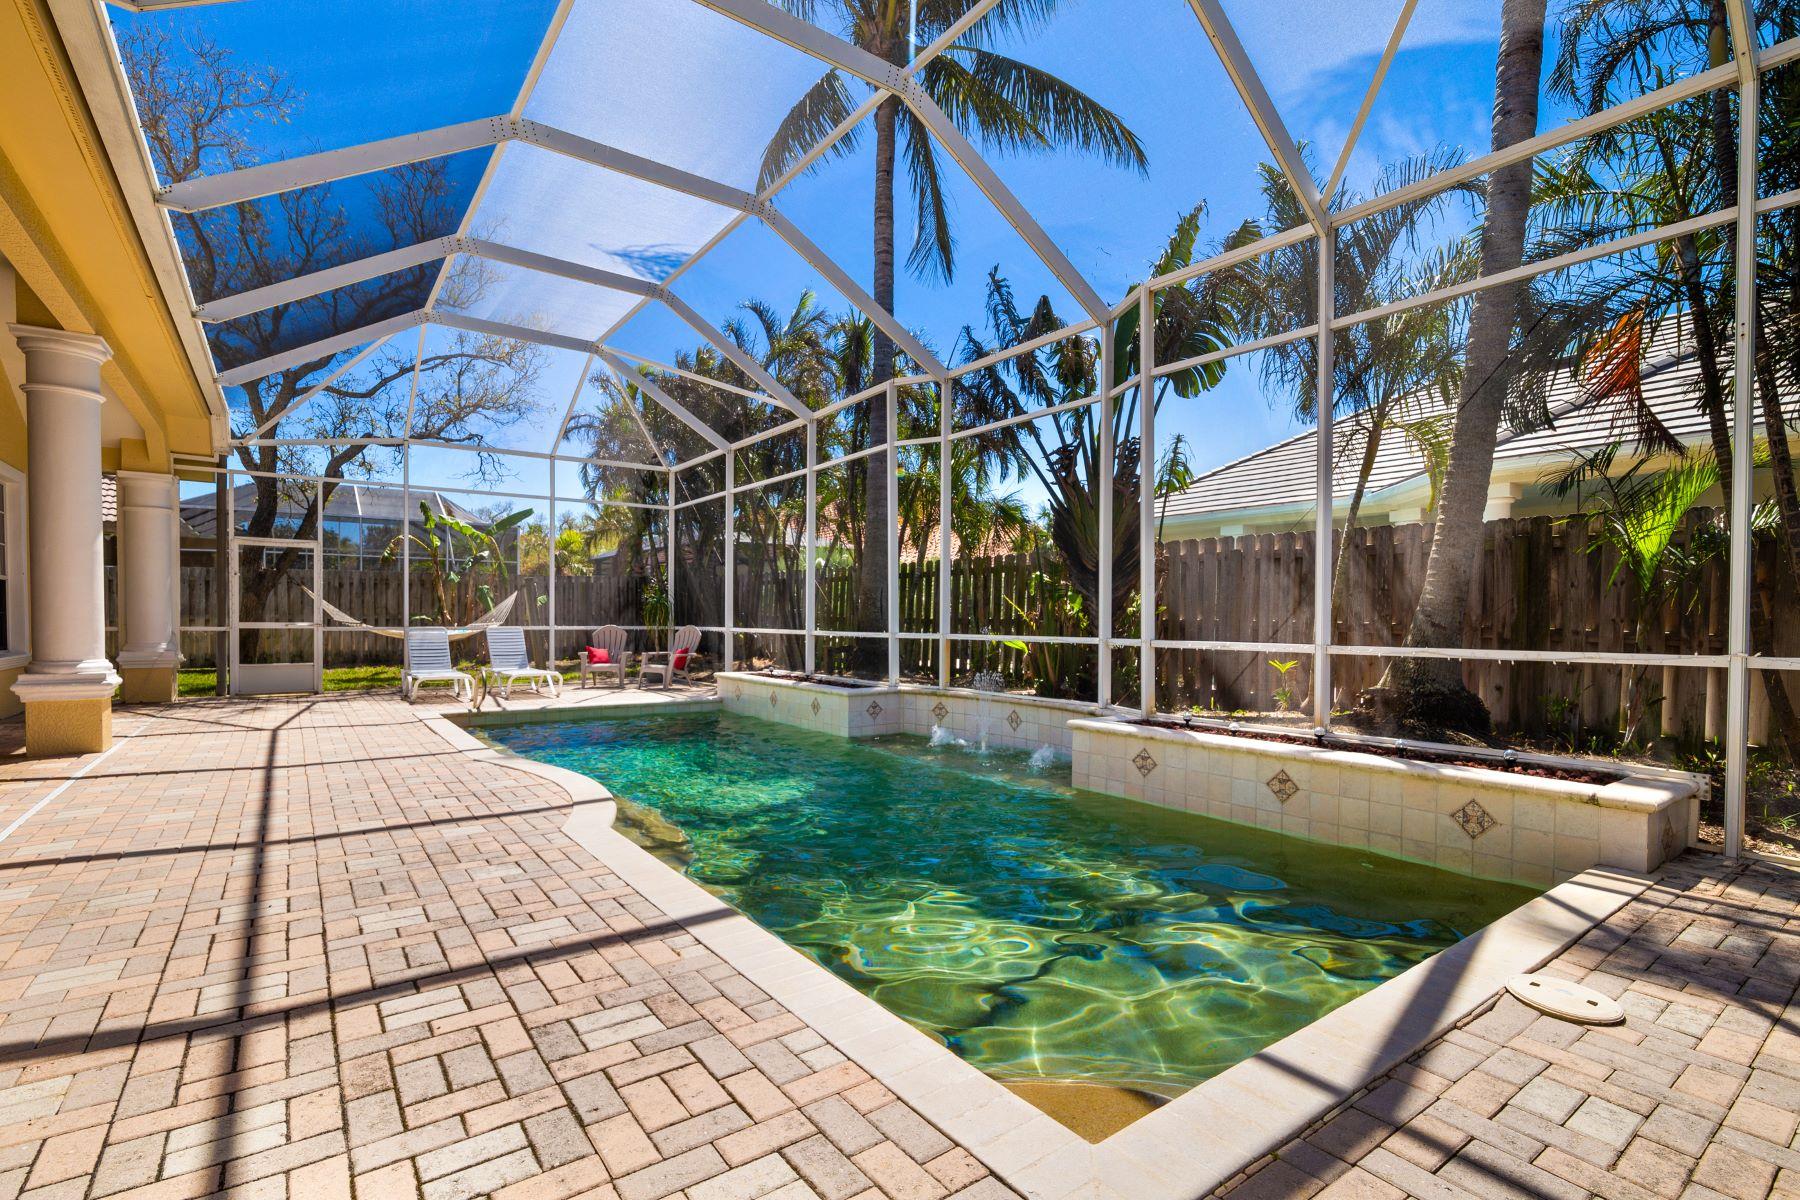 Additional photo for property listing at Rio Villa Subdivision 421 Rio Villa Boulevard Indialantic, Florida 32903 United States